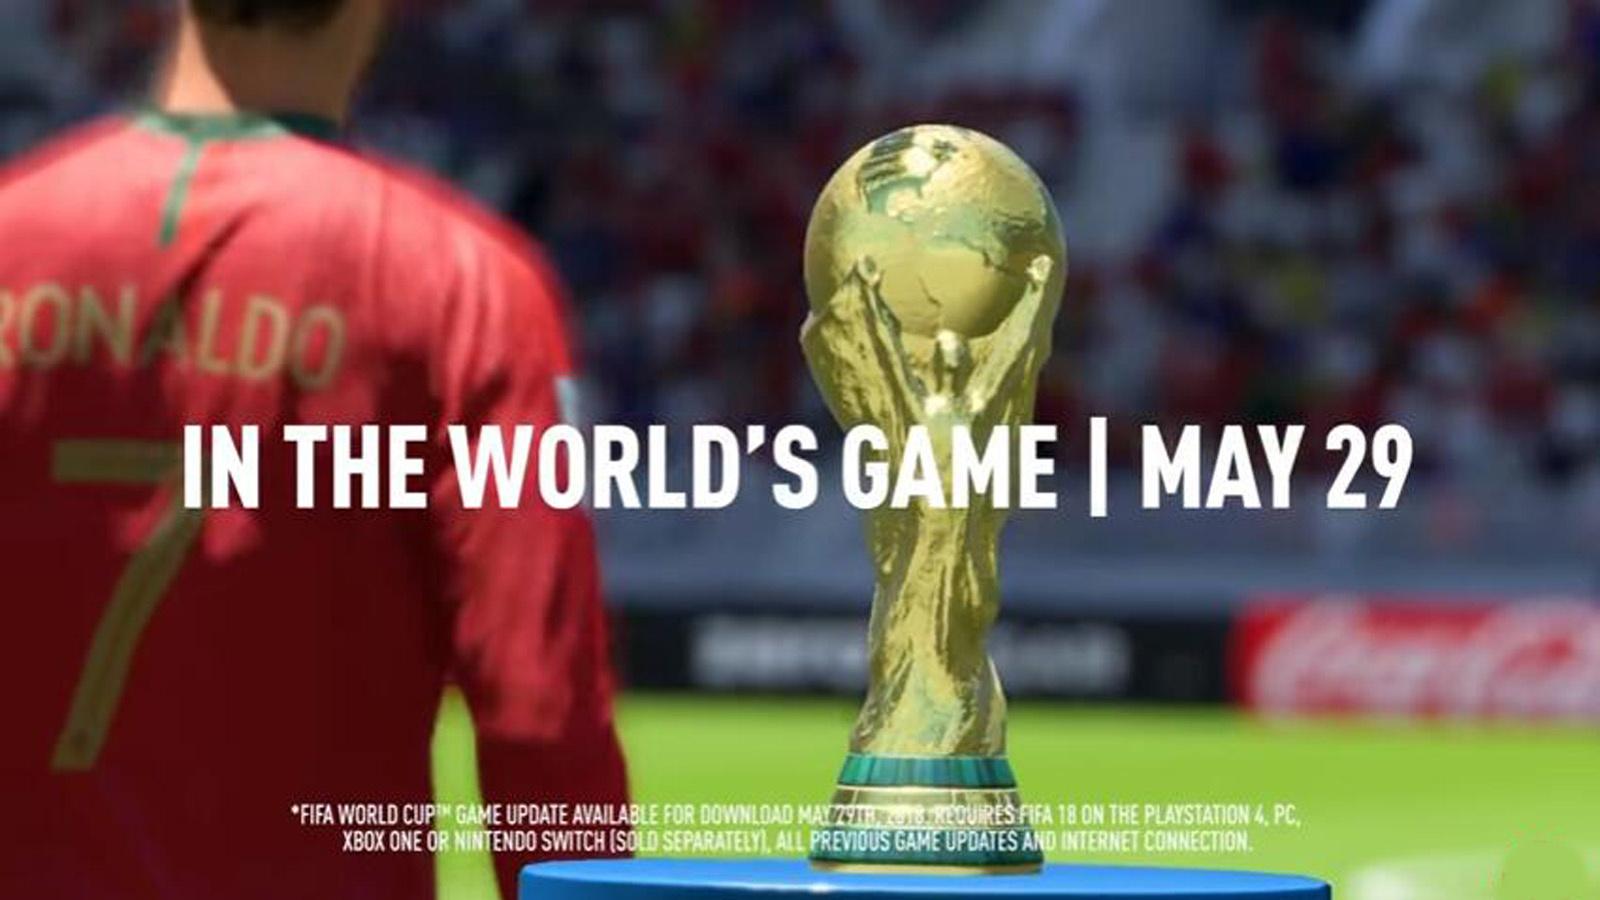 《FIFA 18》世界盃資料片公佈,C羅、穆勒等球星出演預告片